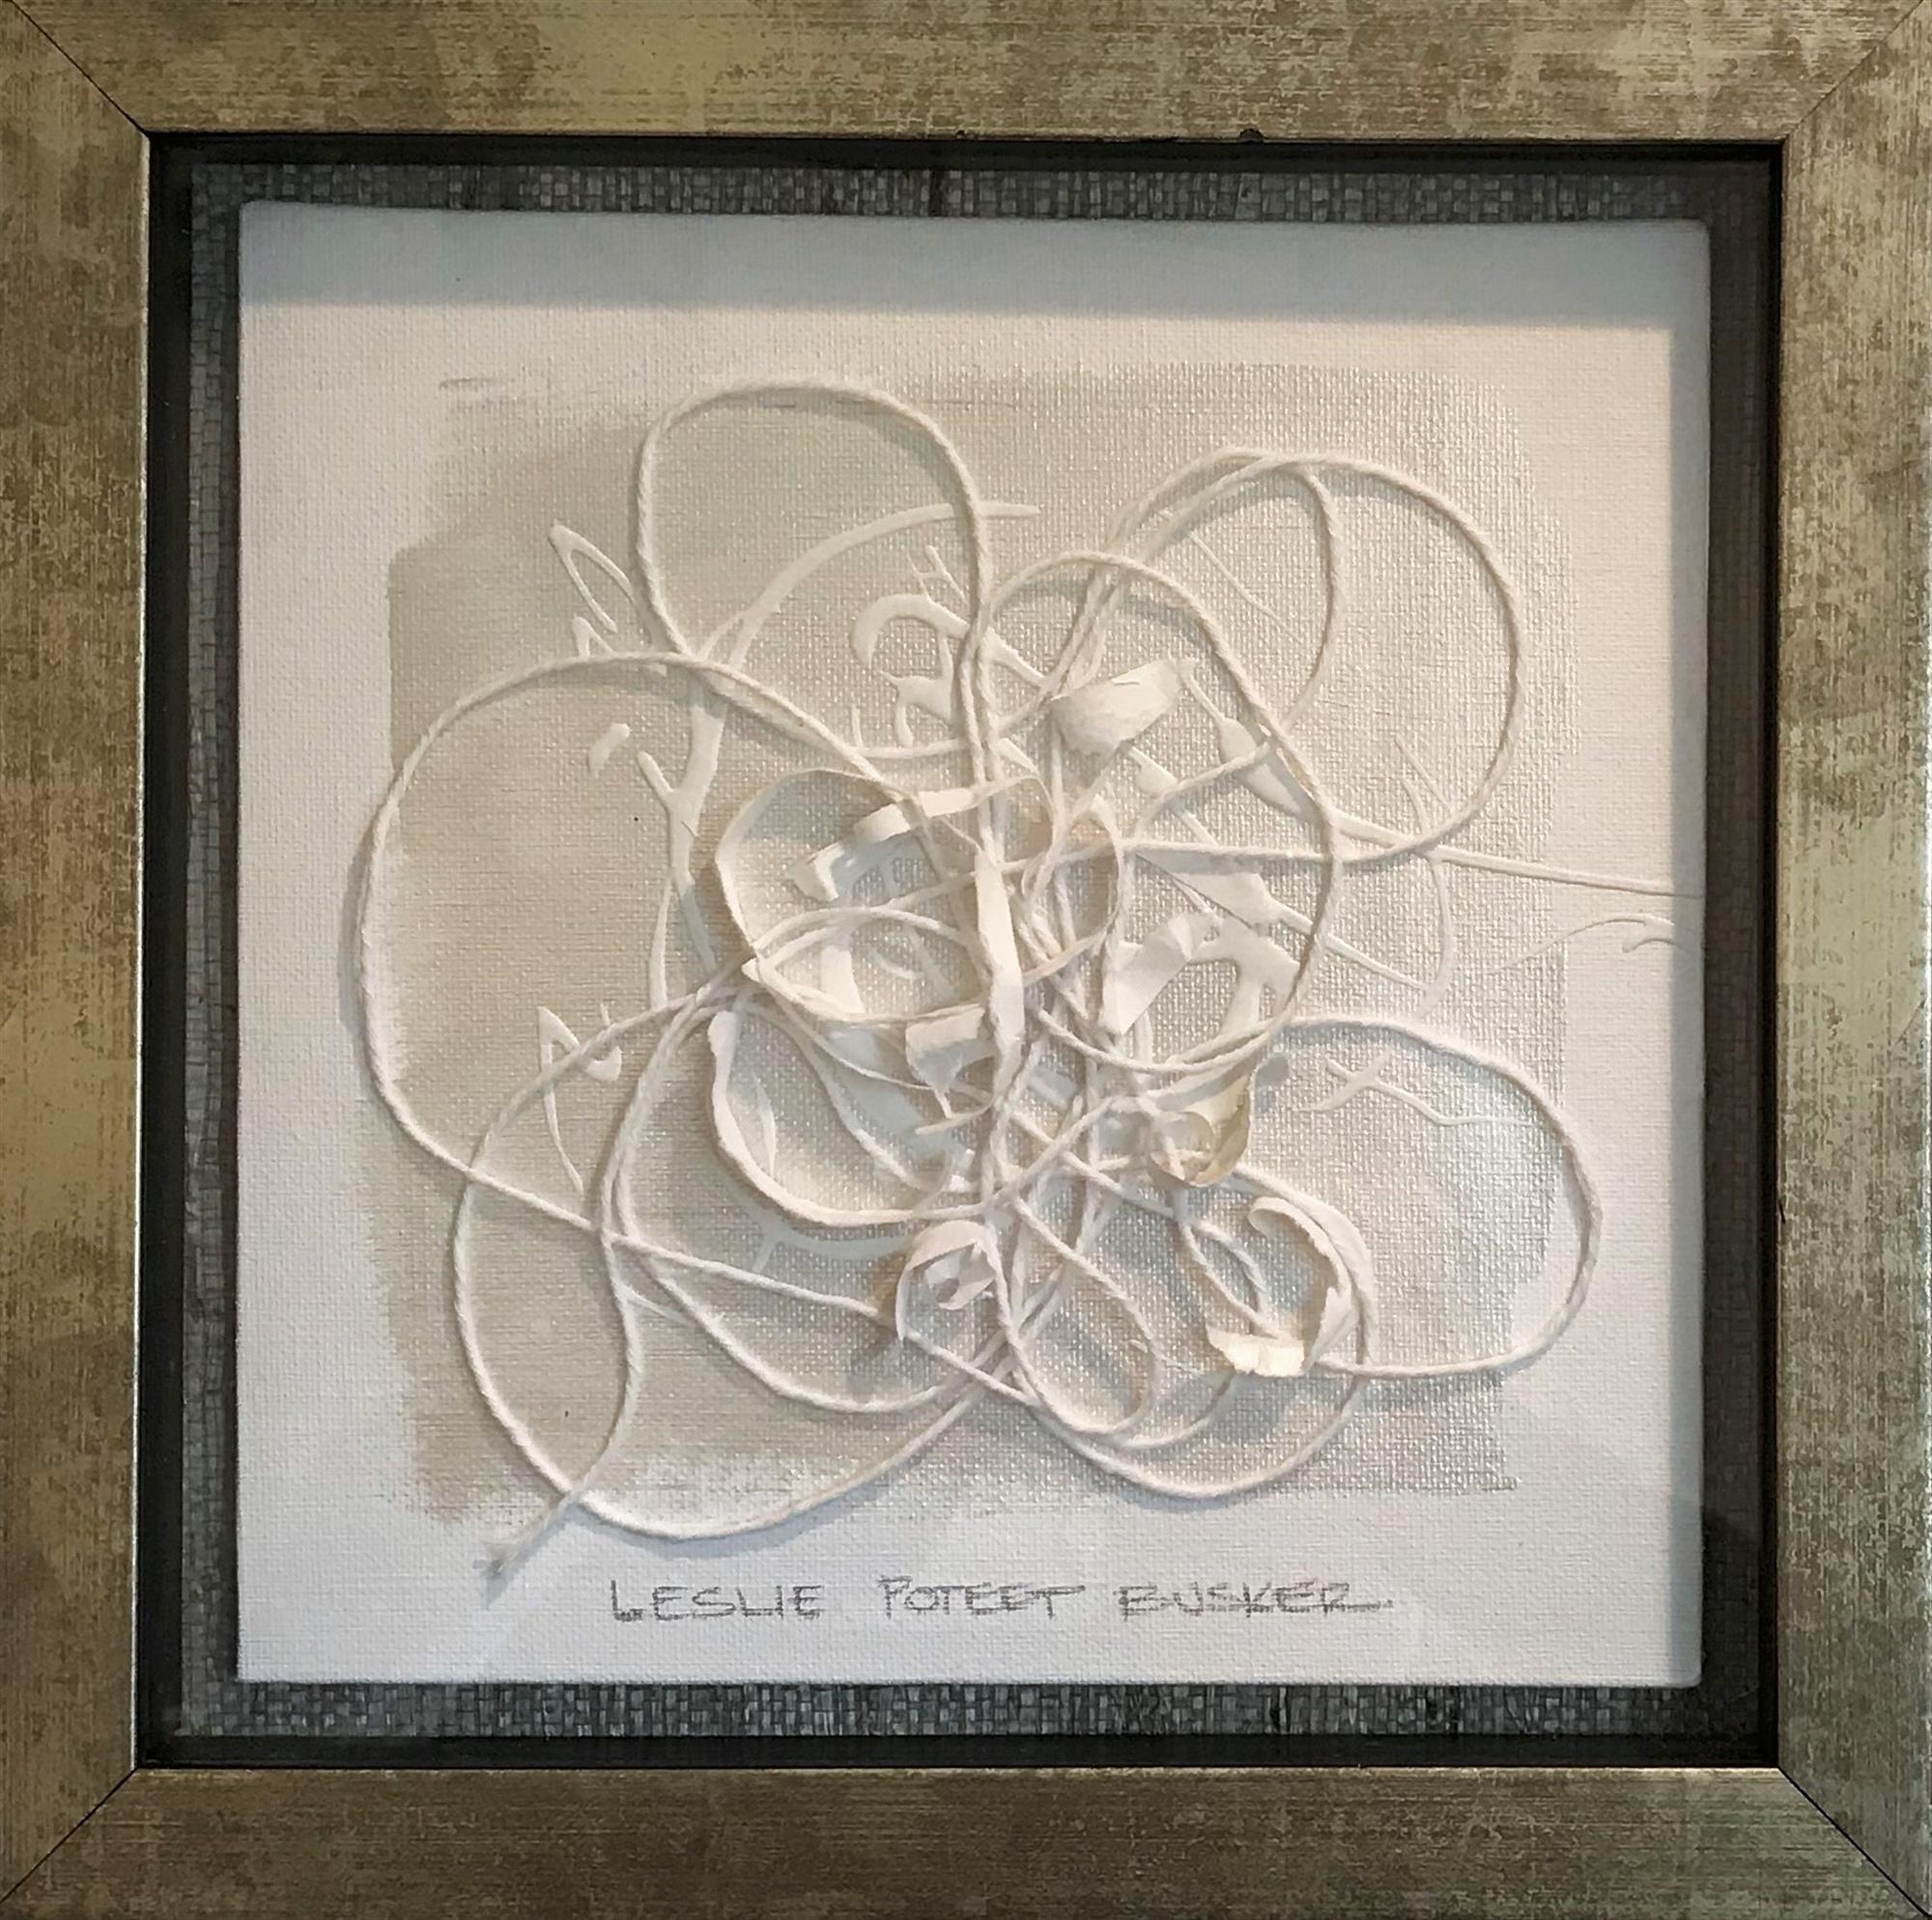 Fleur VI by Leslie Poteet Busker